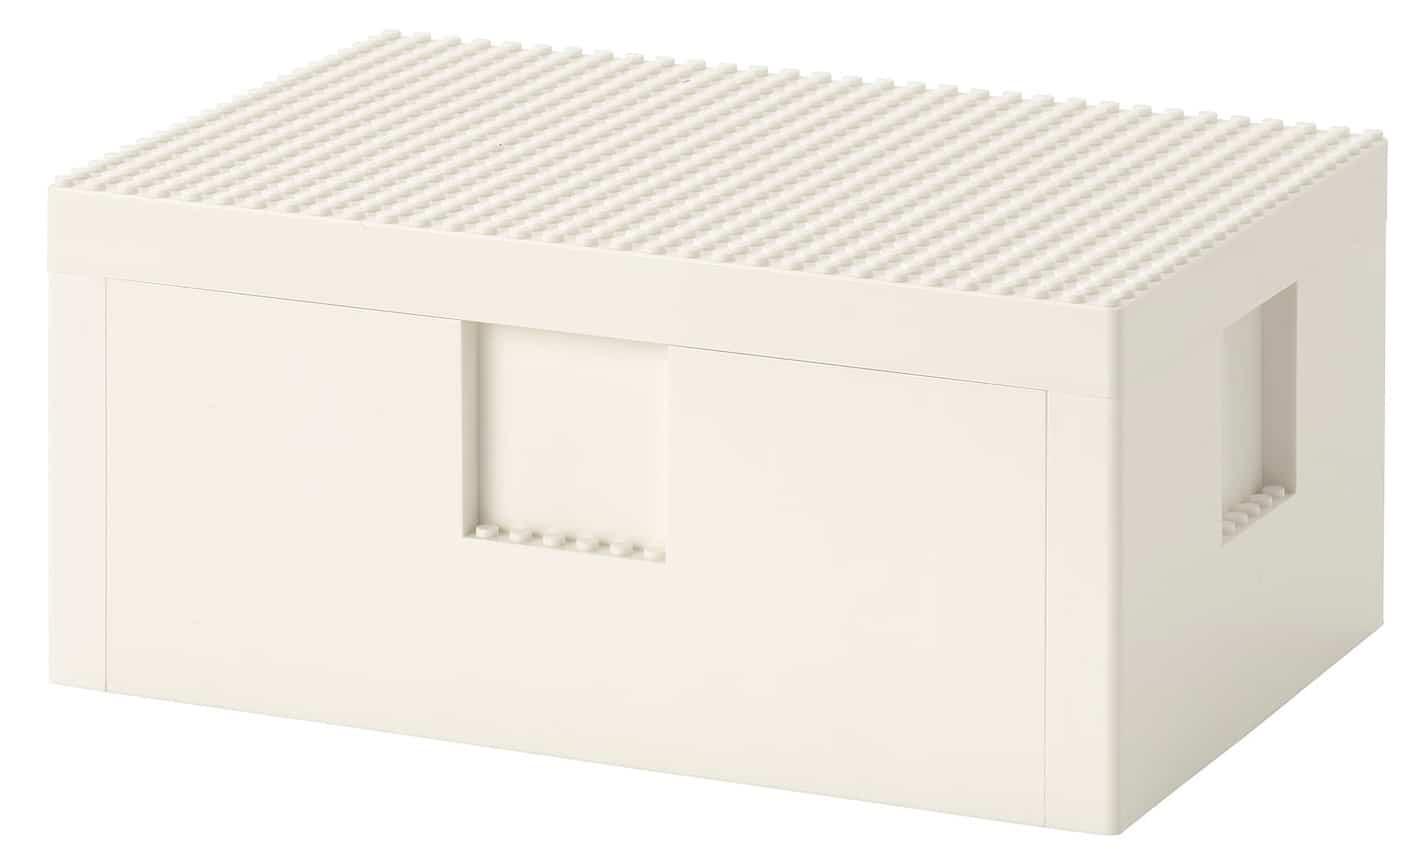 Ikea X LEGO Bygglek Box Mittel